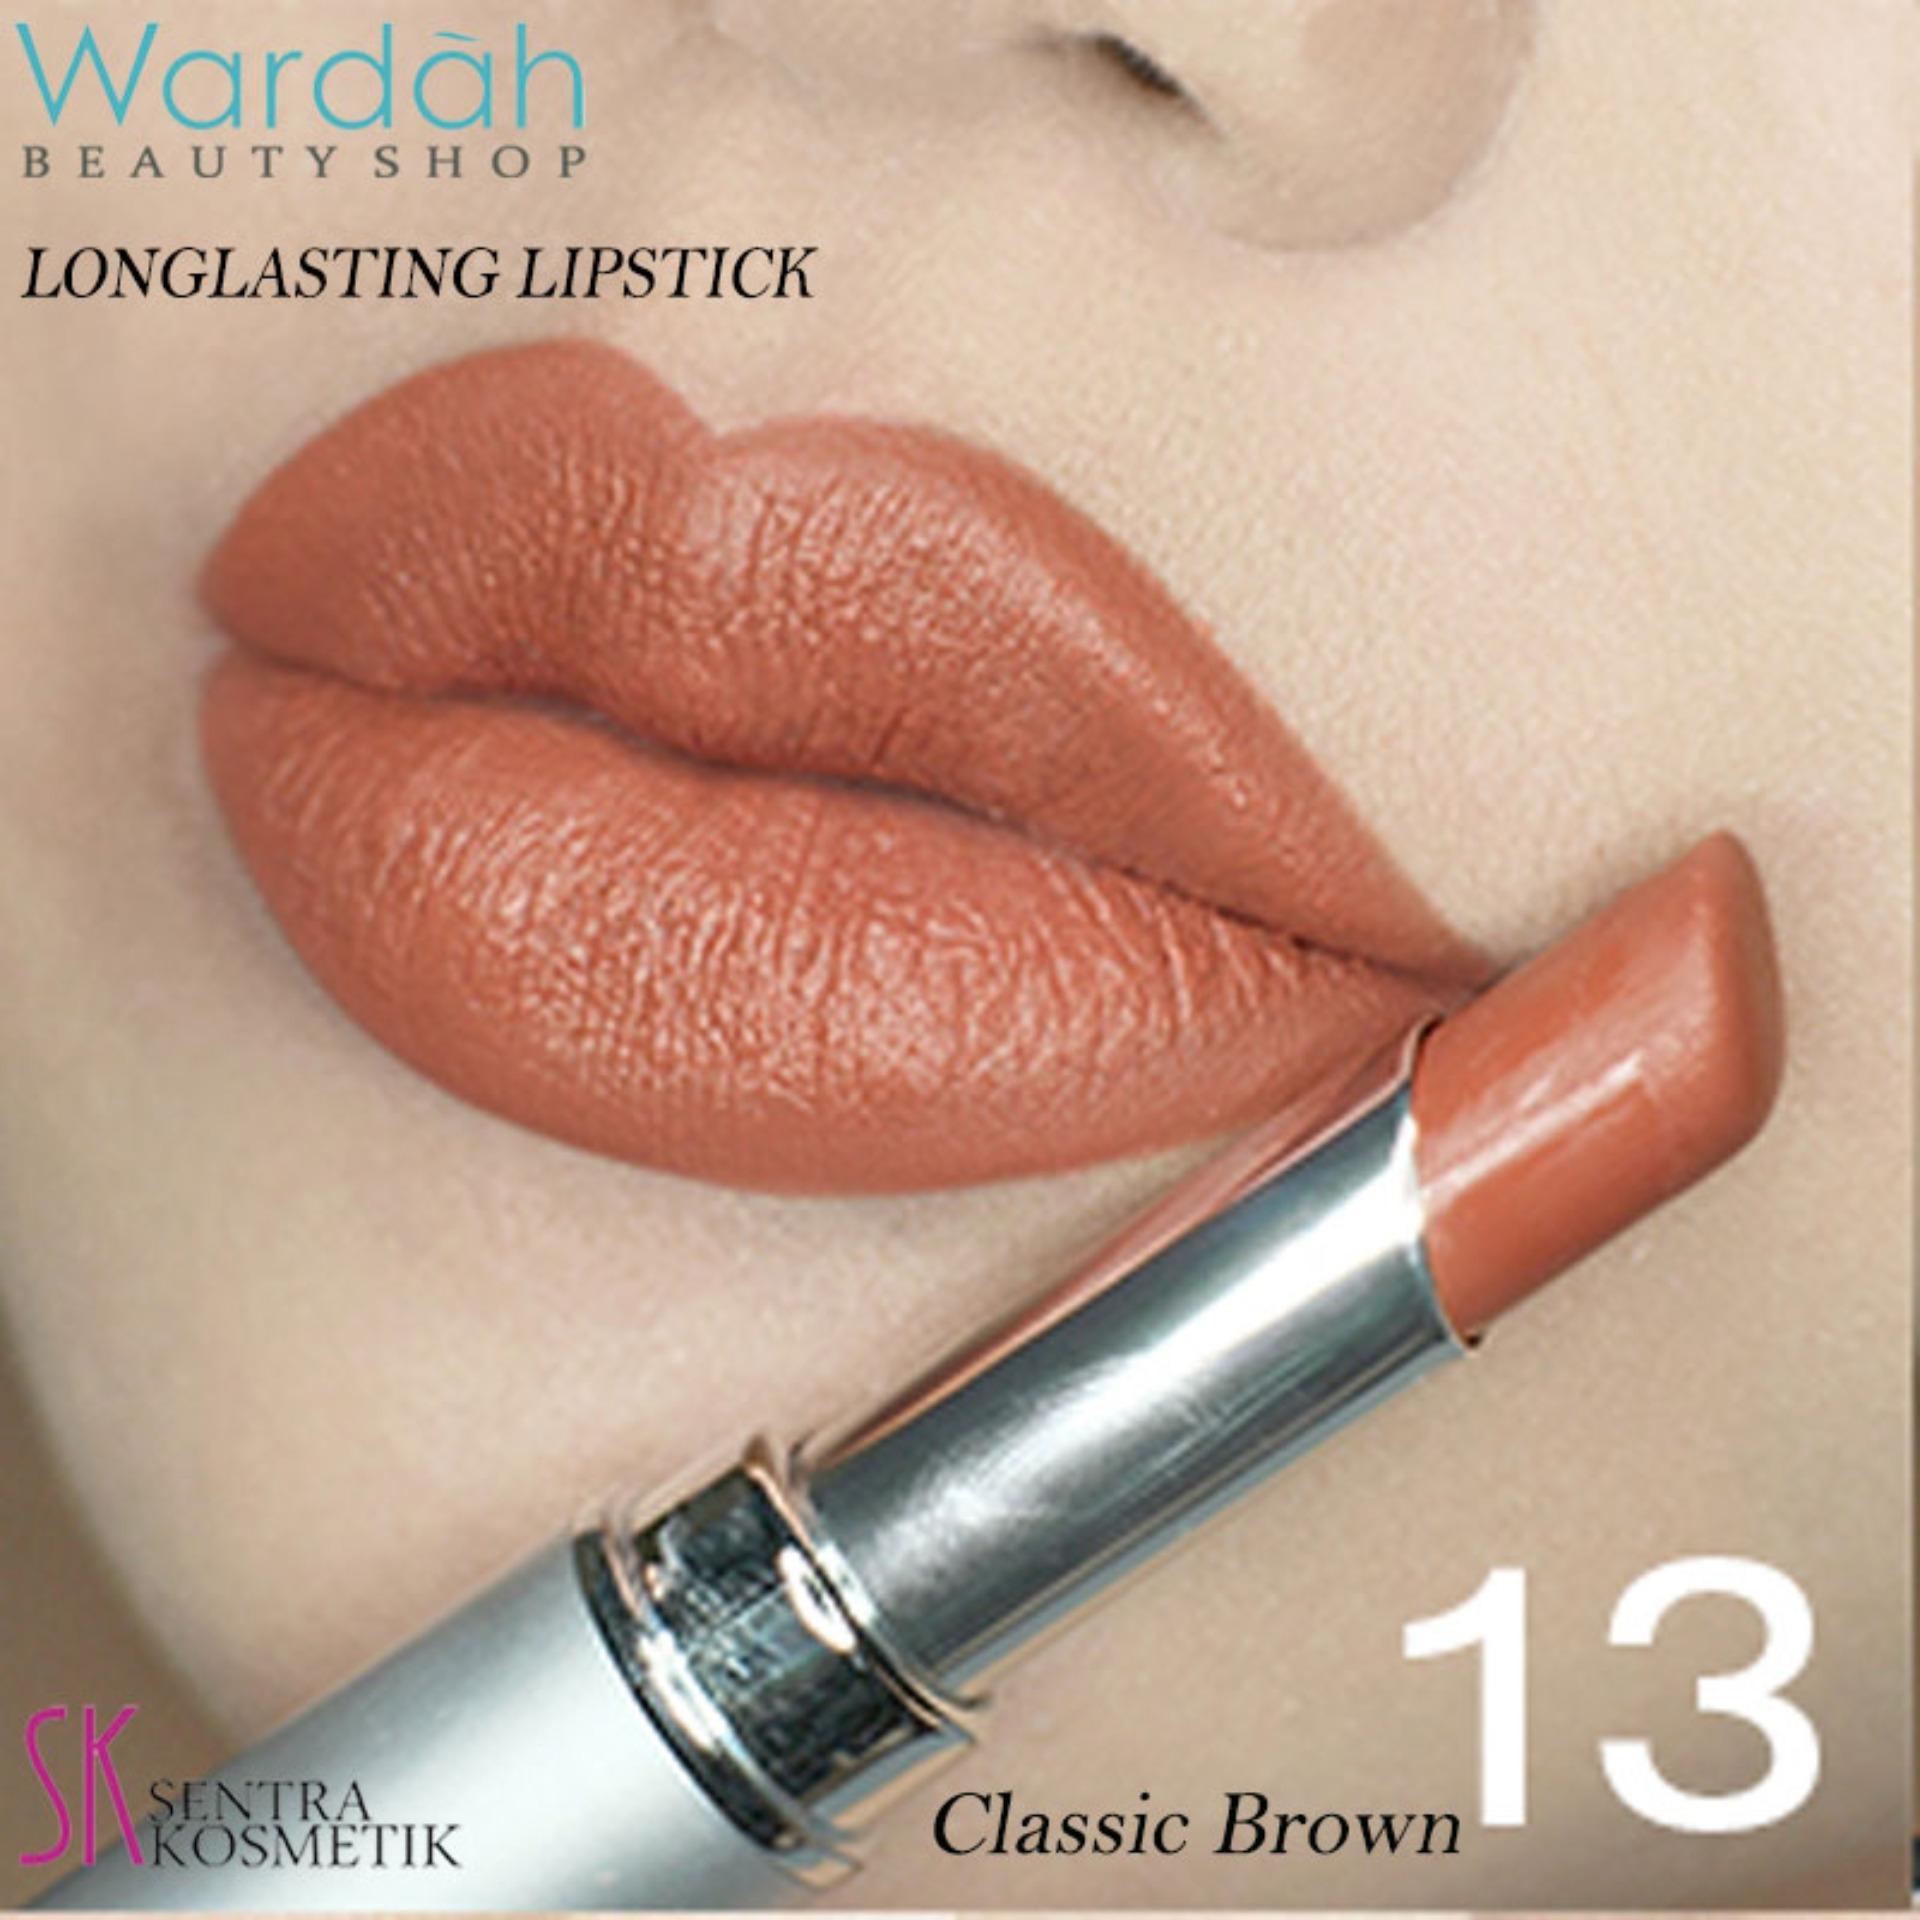 Hemat Wardah Longlasting Lipstick No 13 Classic Brown Facial